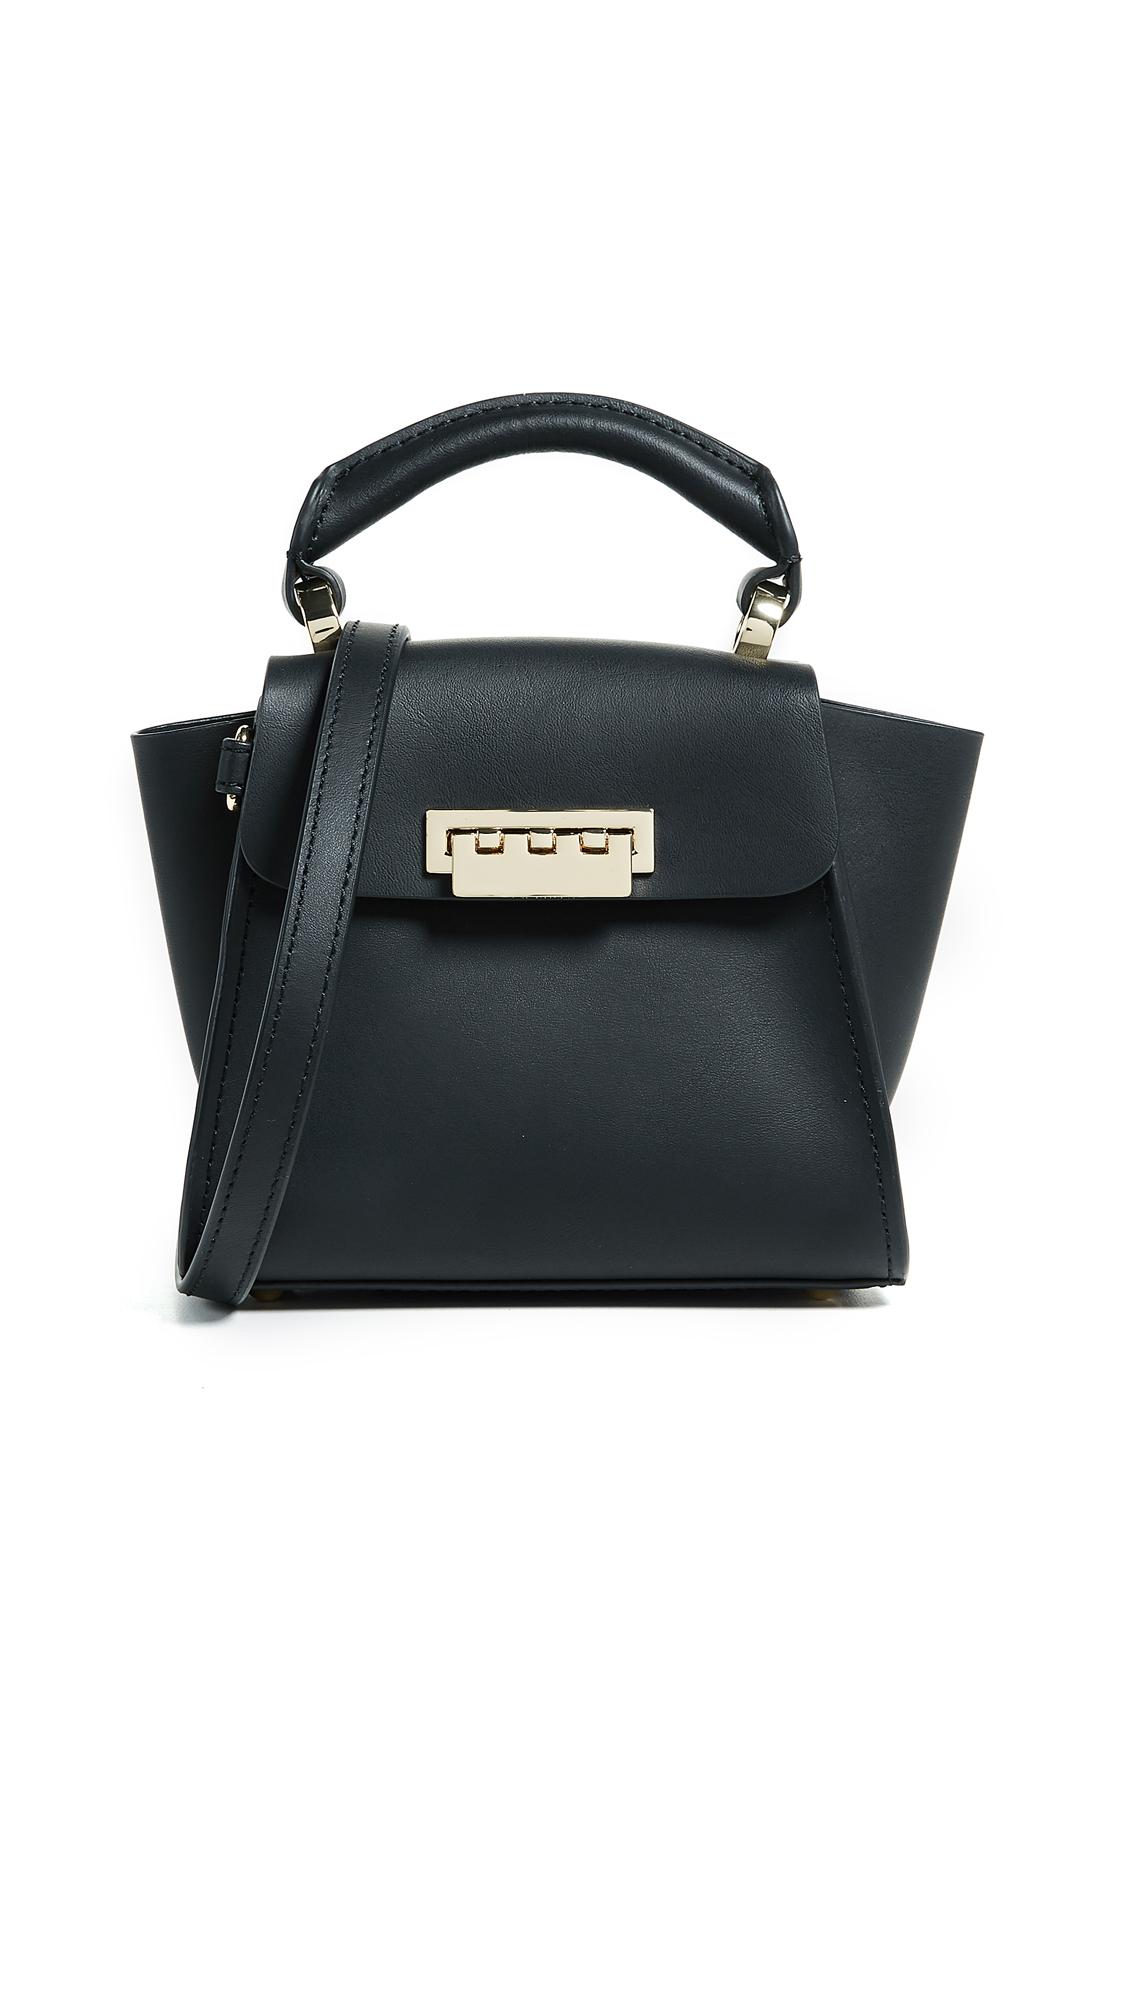 0f261de5e3 Zac Zac Posen Eartha Mini Top-Handle Leather Satchel In Black ...